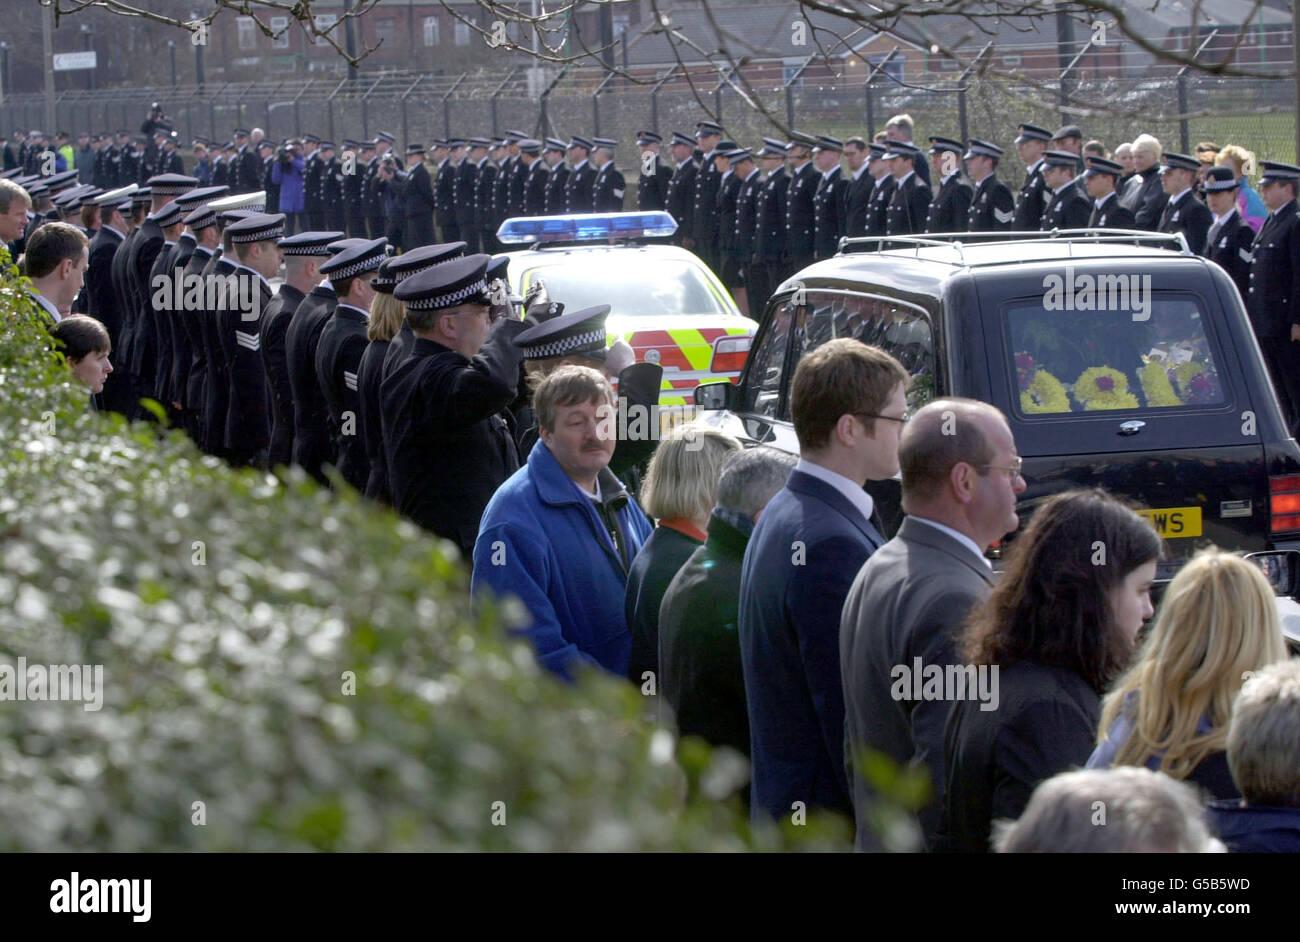 Alison Armitage Photos alison armitage funeral stock photo: 106581593 - alamy